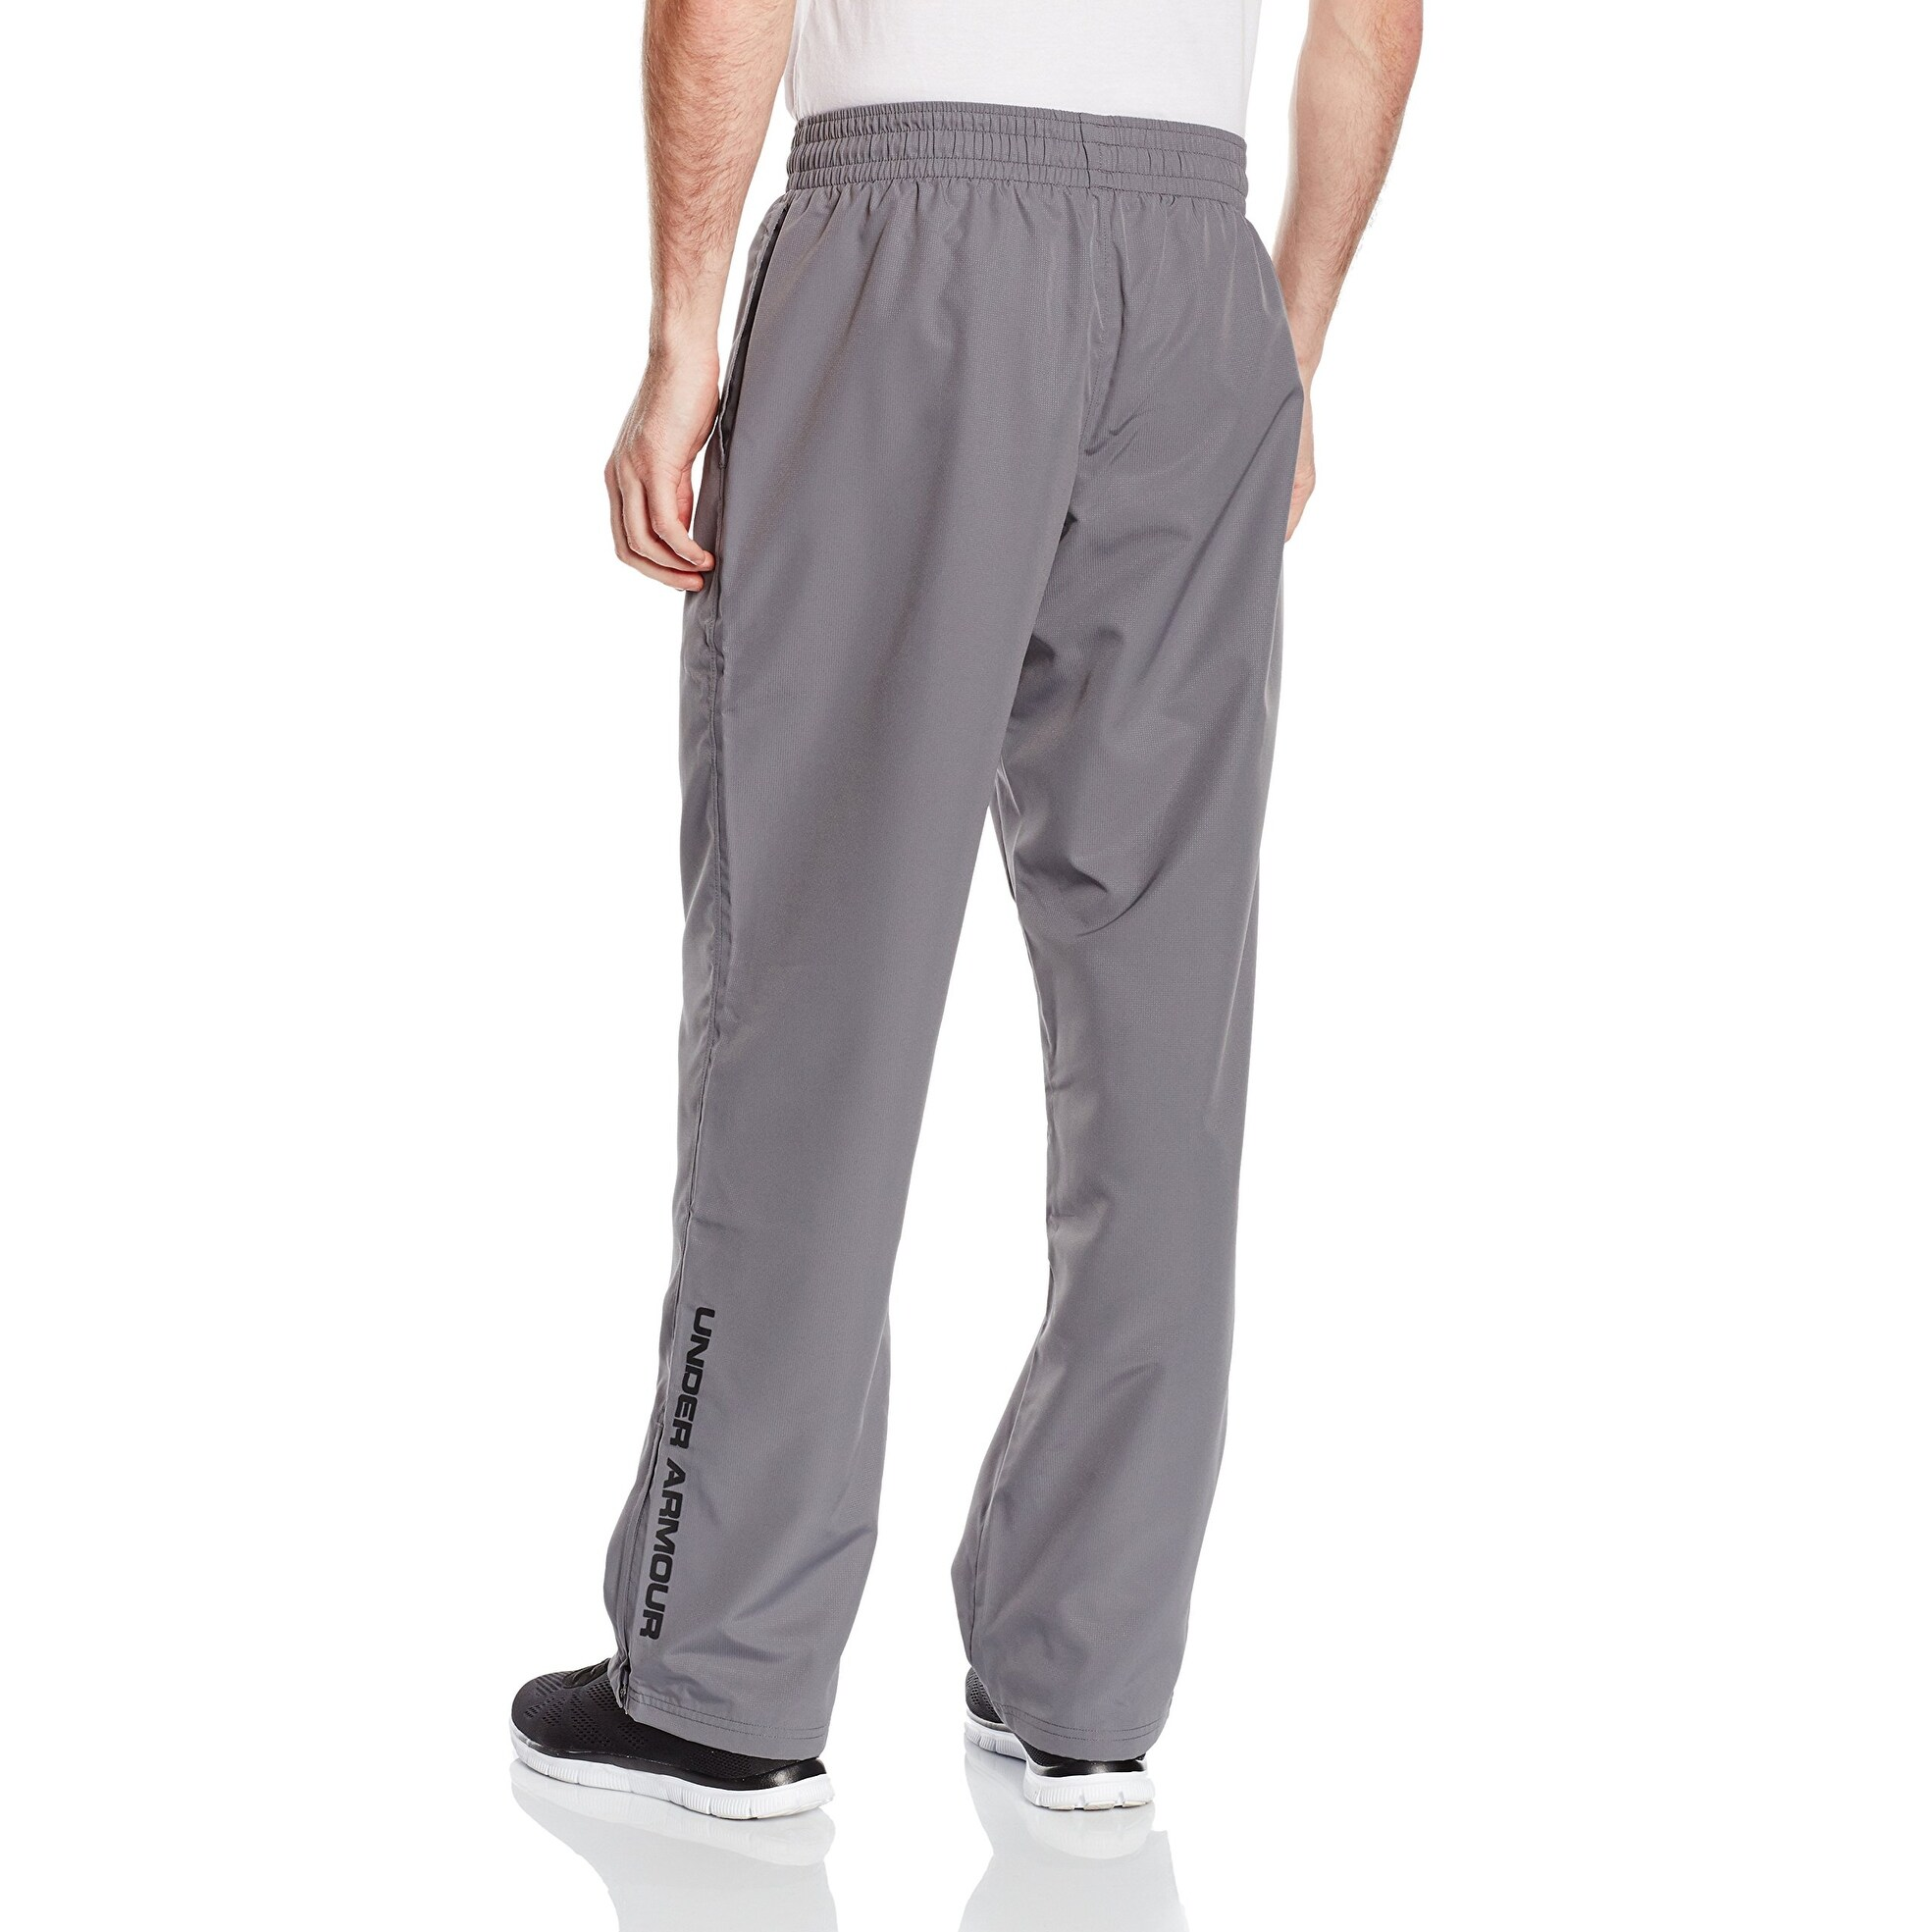 Under Armour Straight Leg Warm Up Pants